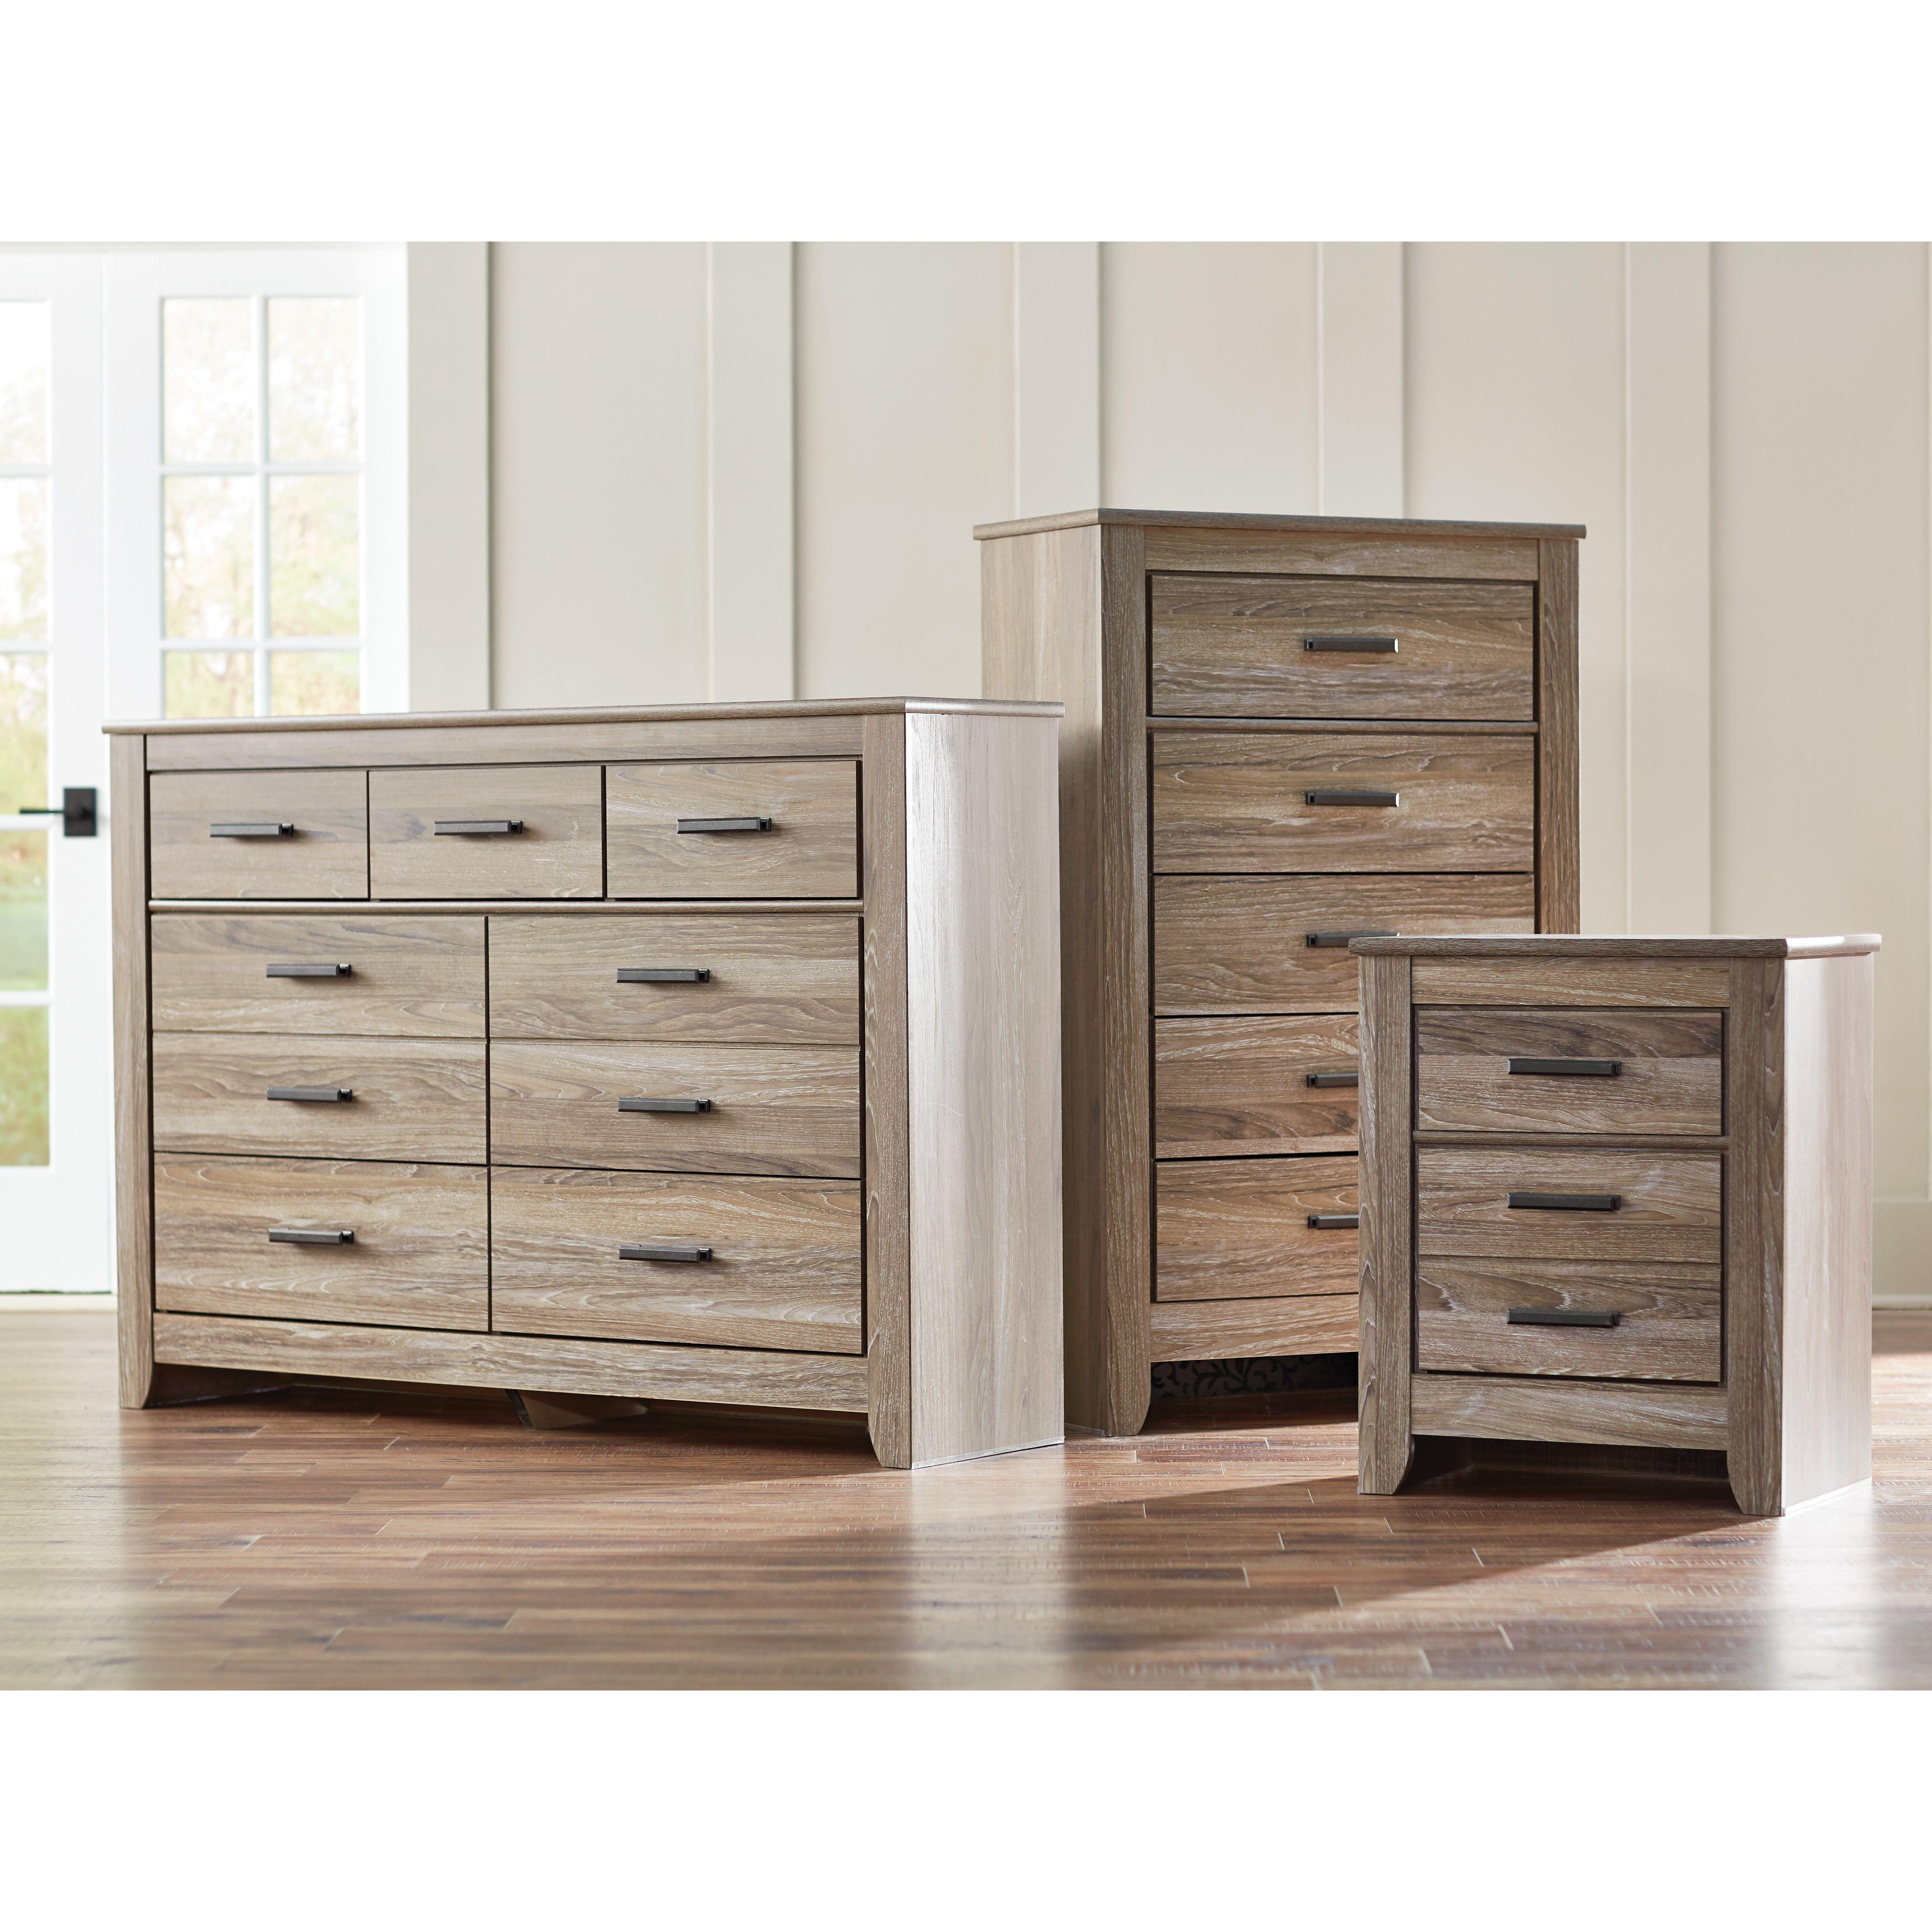 Zelen Chest 7 Drawer Dresser Dresser Drawers Furniture [ 5080 x 5080 Pixel ]